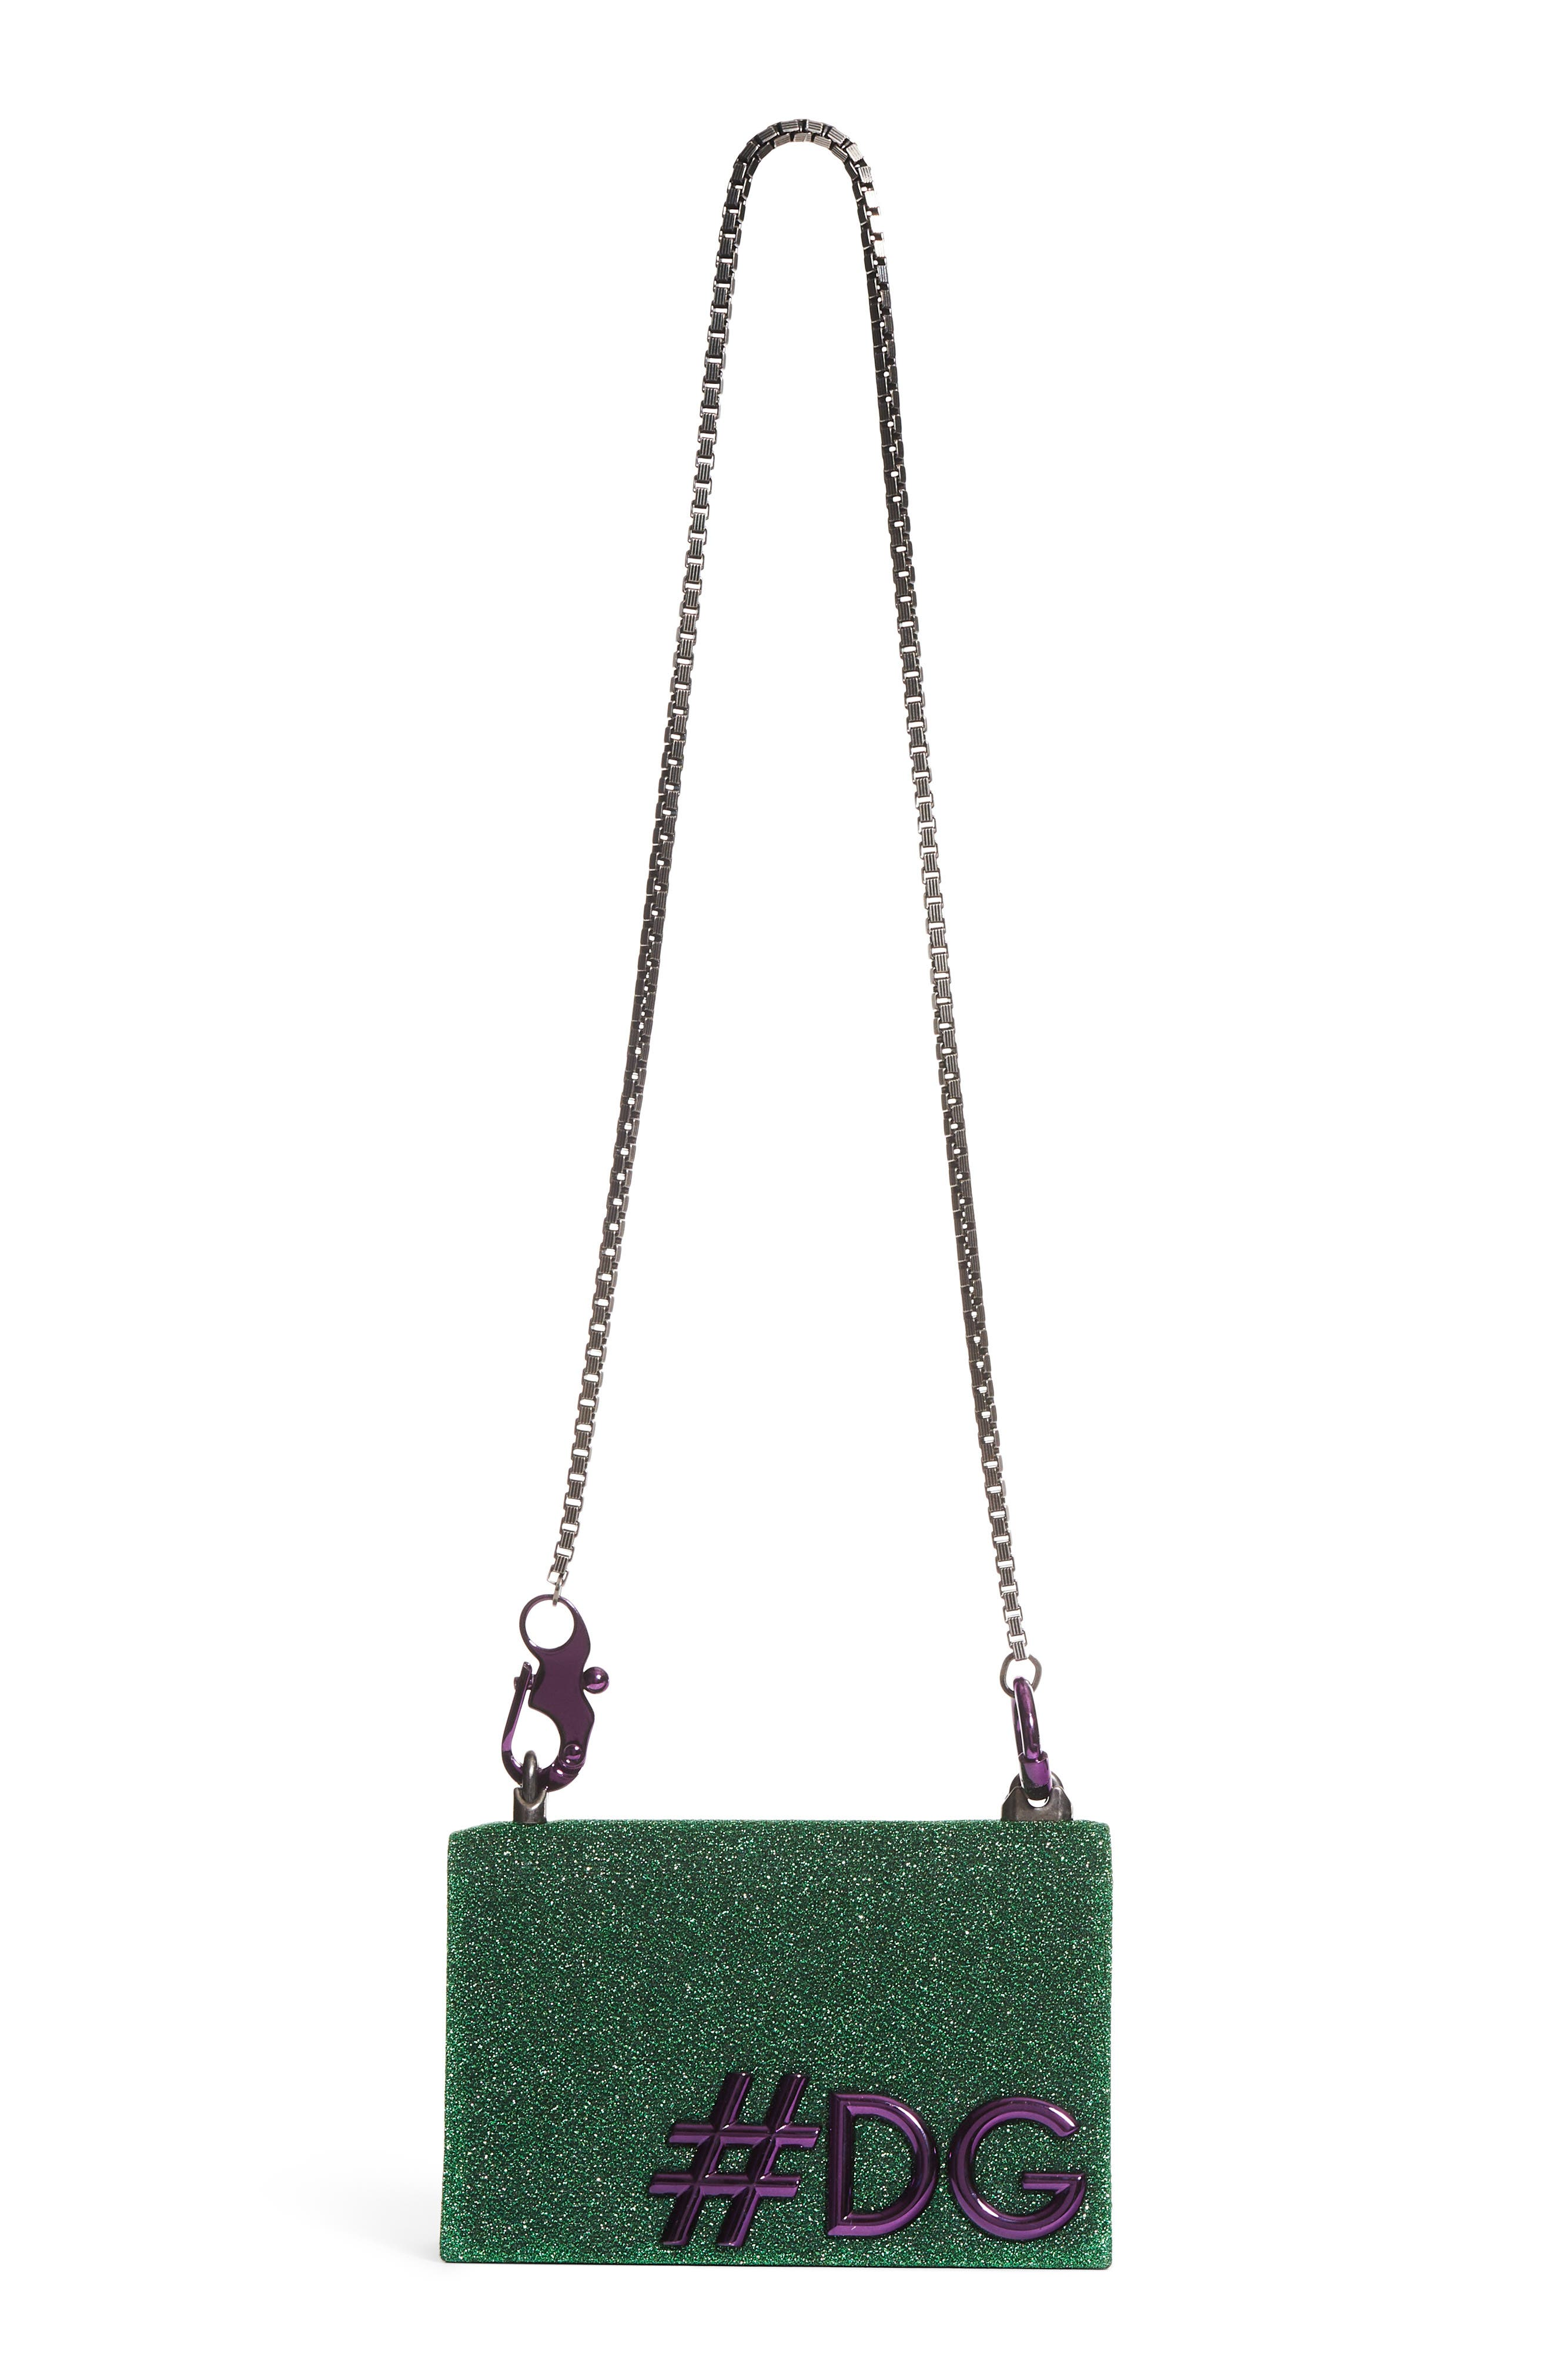 Dolce&Gabbana DG Girls Metallic Shoulder Bag